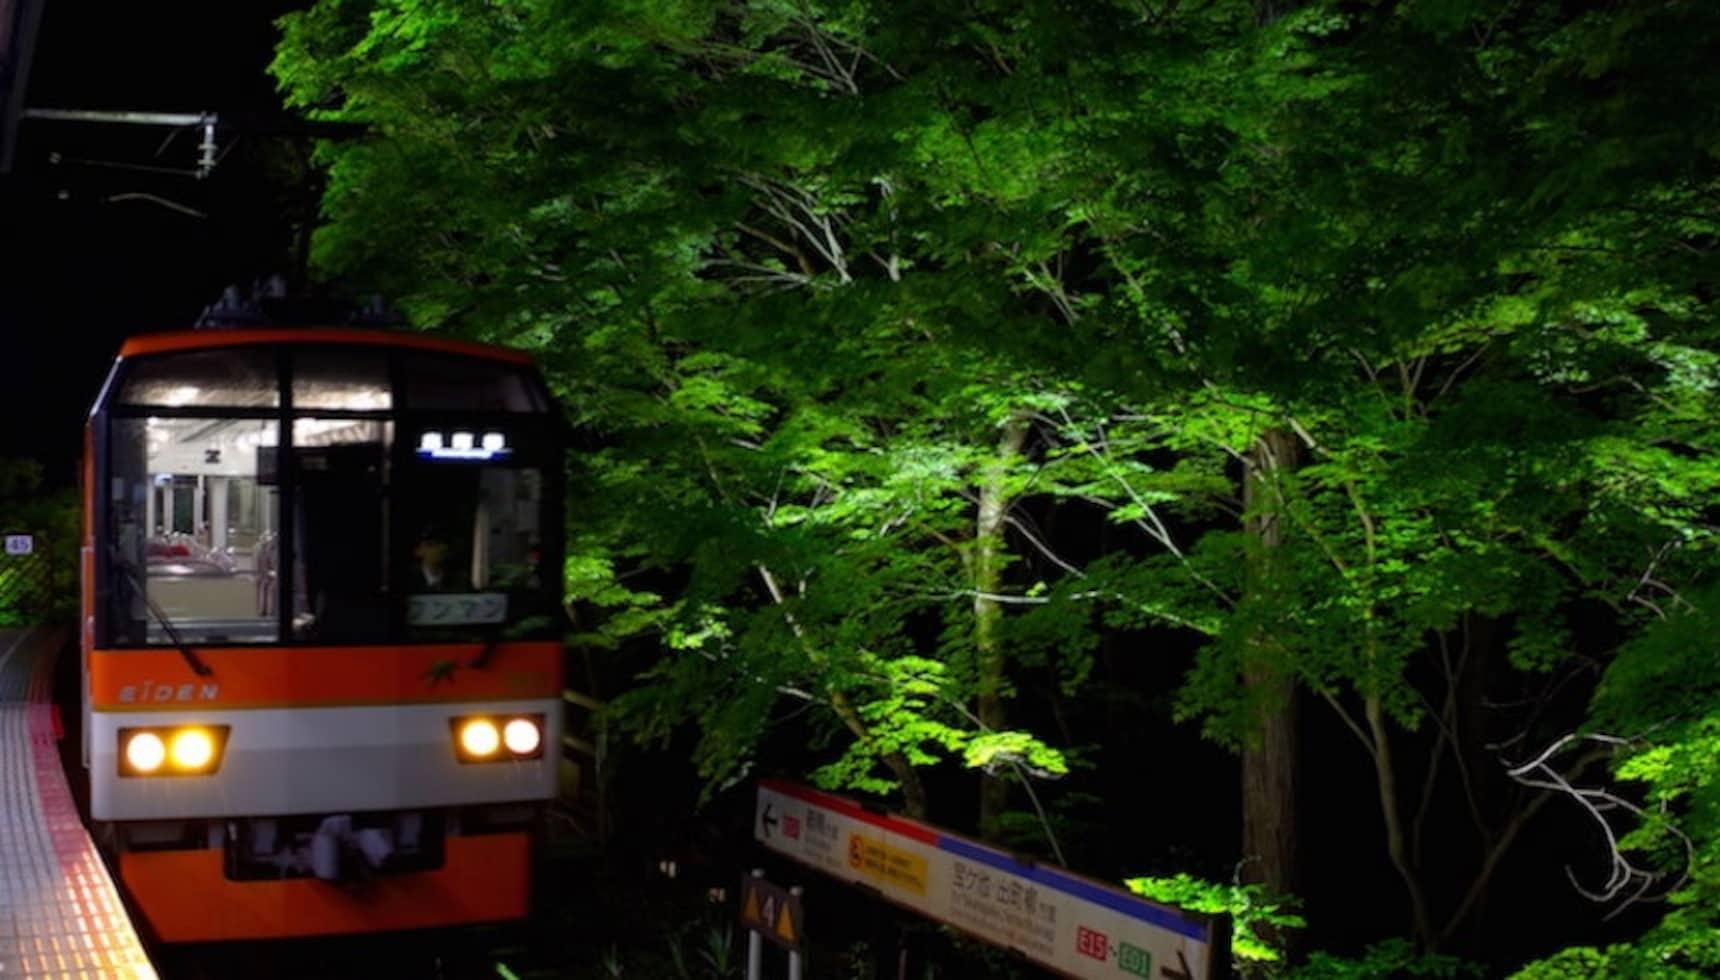 3 Reasons to Visit Kyoto in May